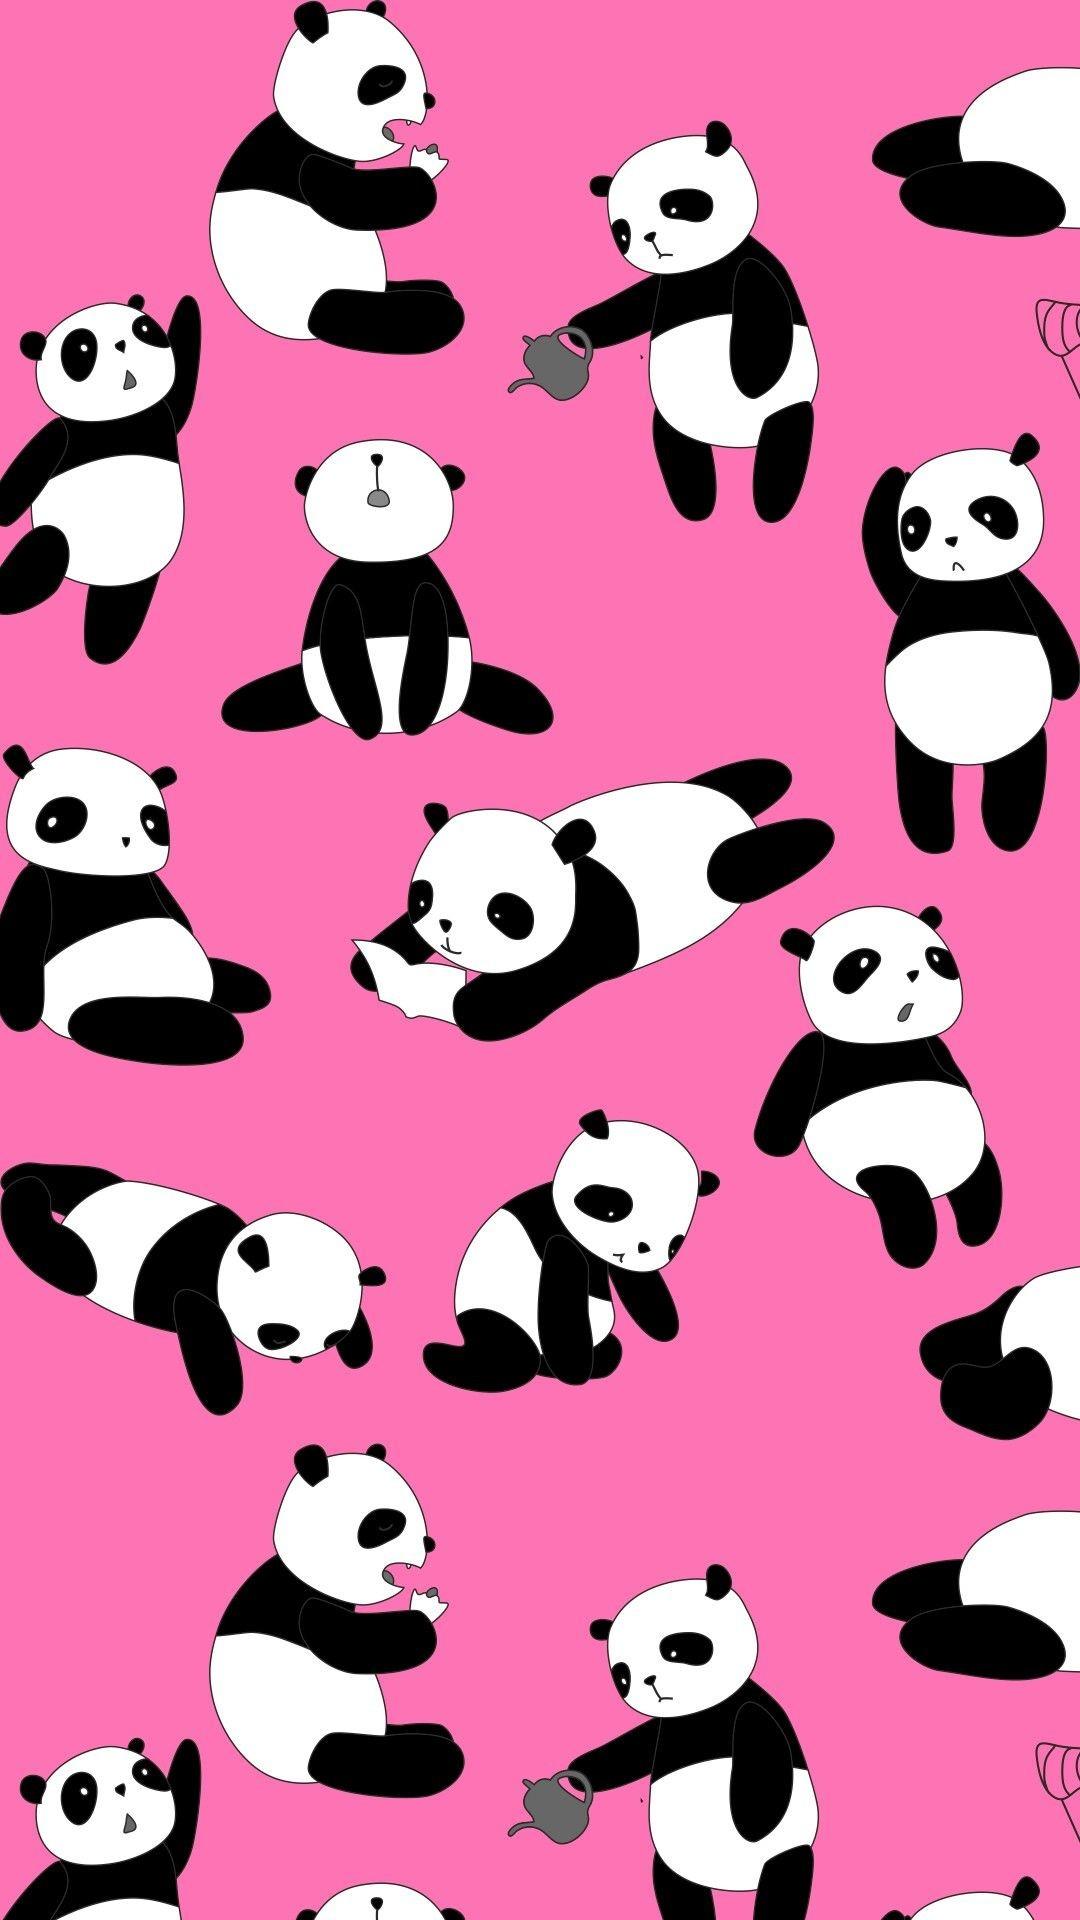 Kawaii Panda Wallpaper (83+ images)